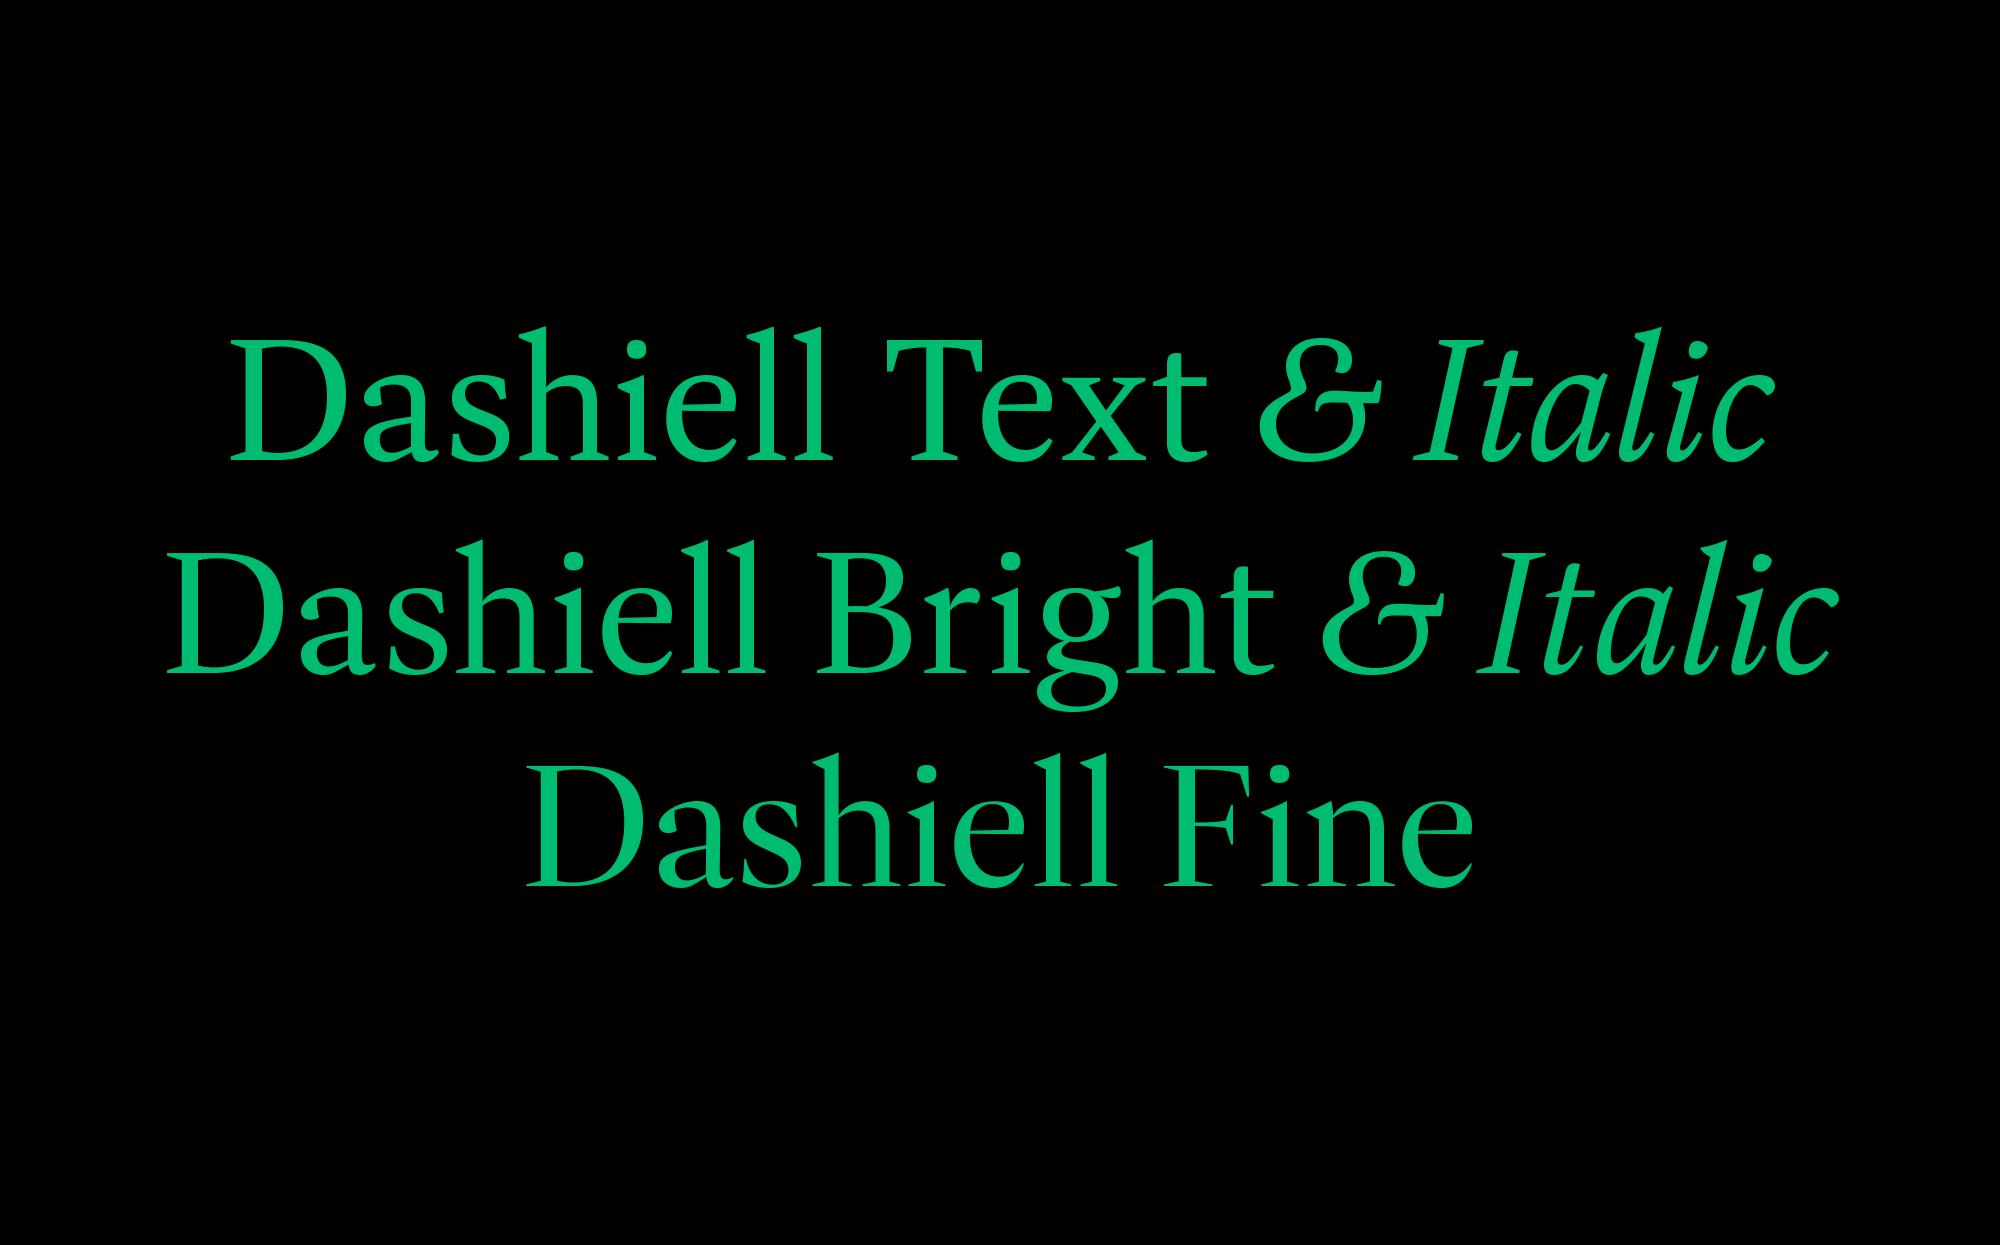 Cover image: Dashiell